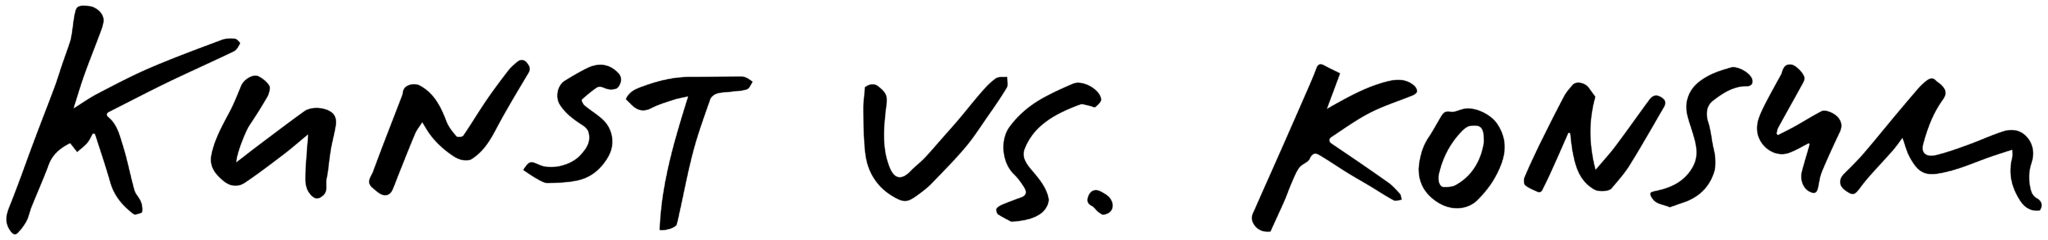 KunstVsKonsum-17